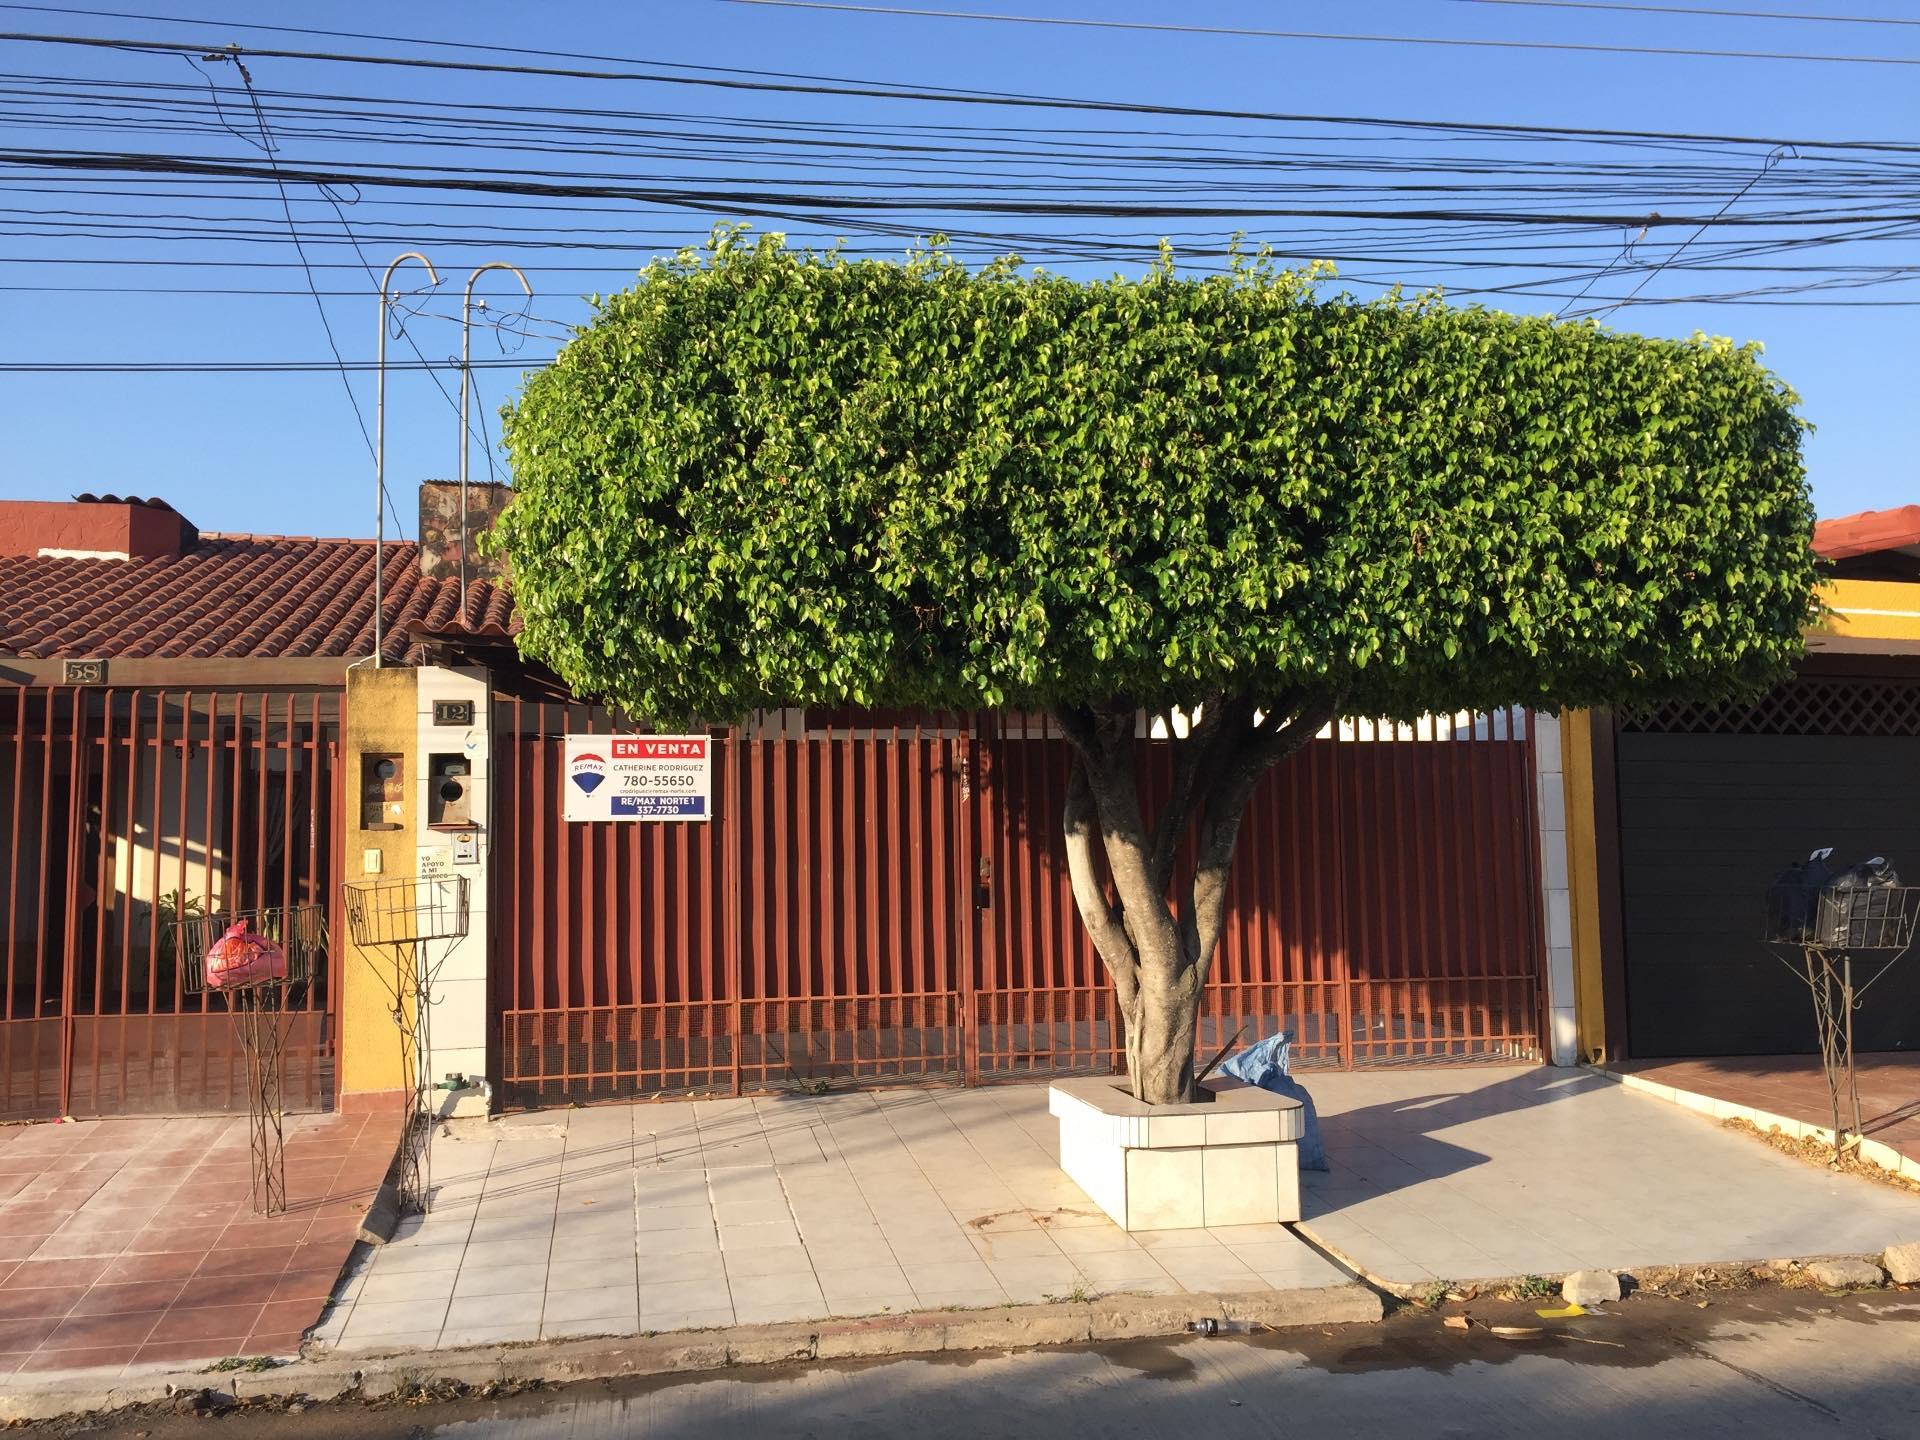 Calle 2 remberto prado no 12 us 95 000 uc 435209 for Calle prado jerez 3 navacerrada